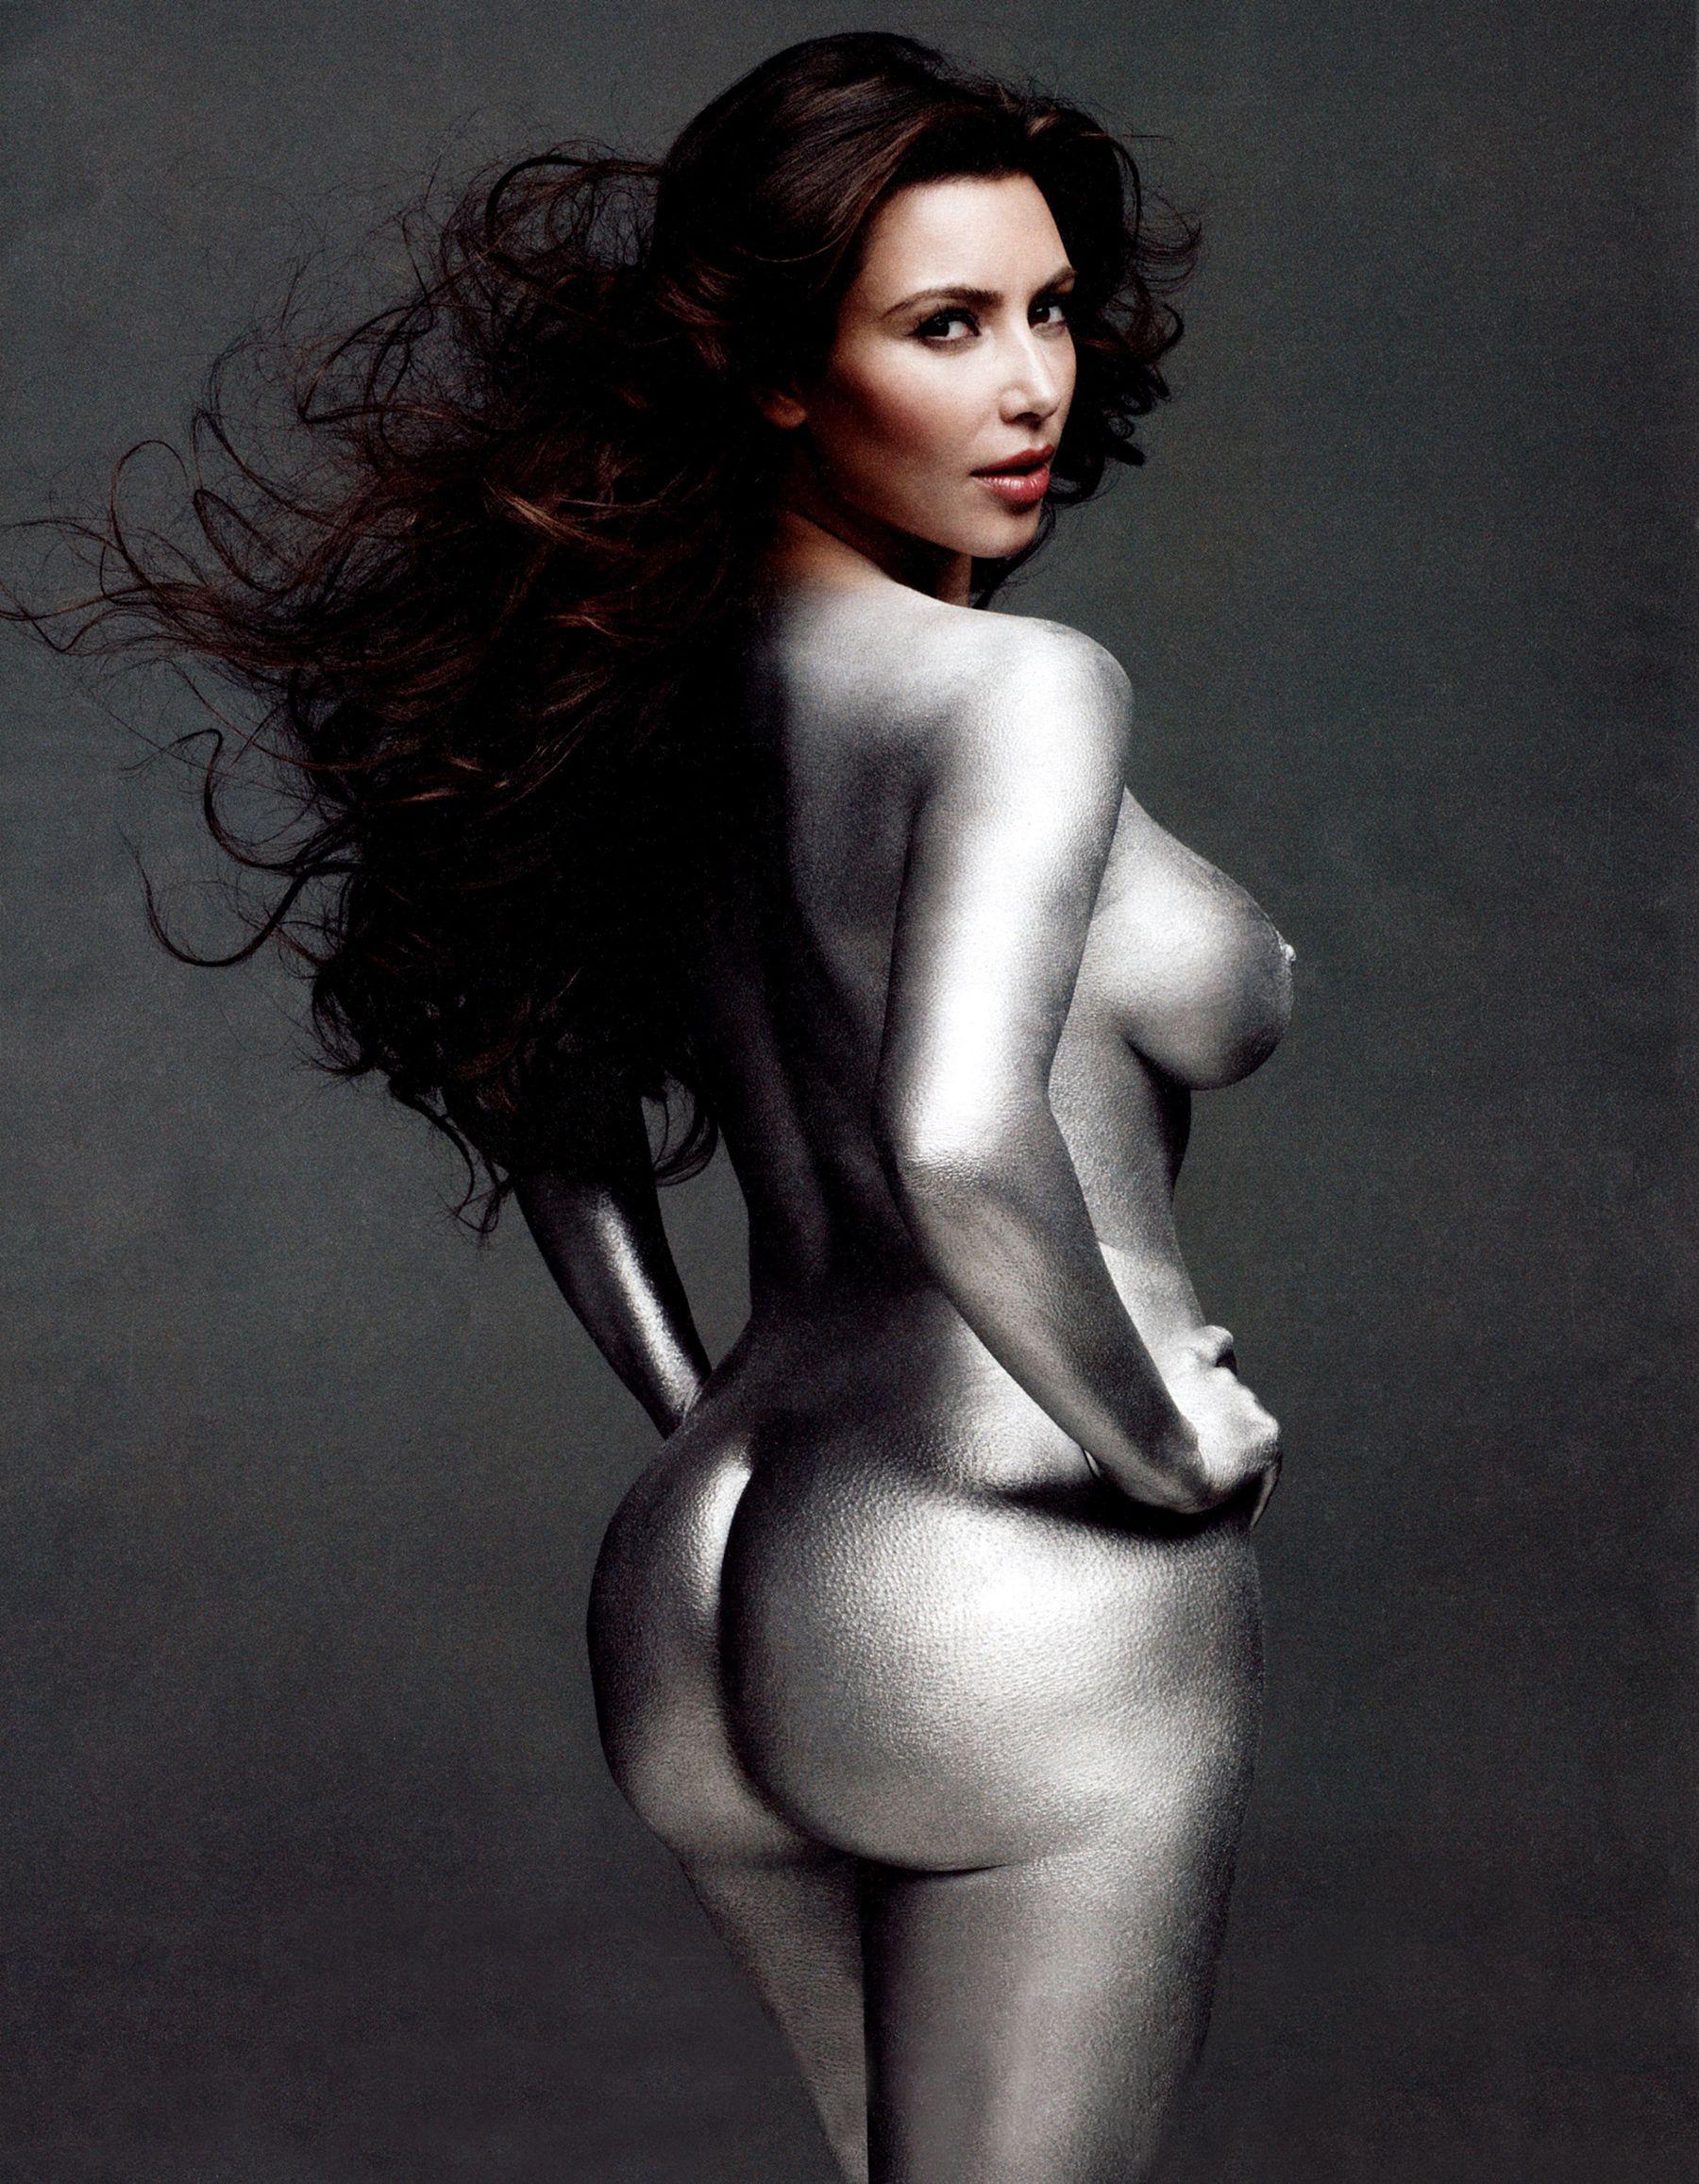 kim kardashian silver nude 2 - kim kardashian silver nude 2